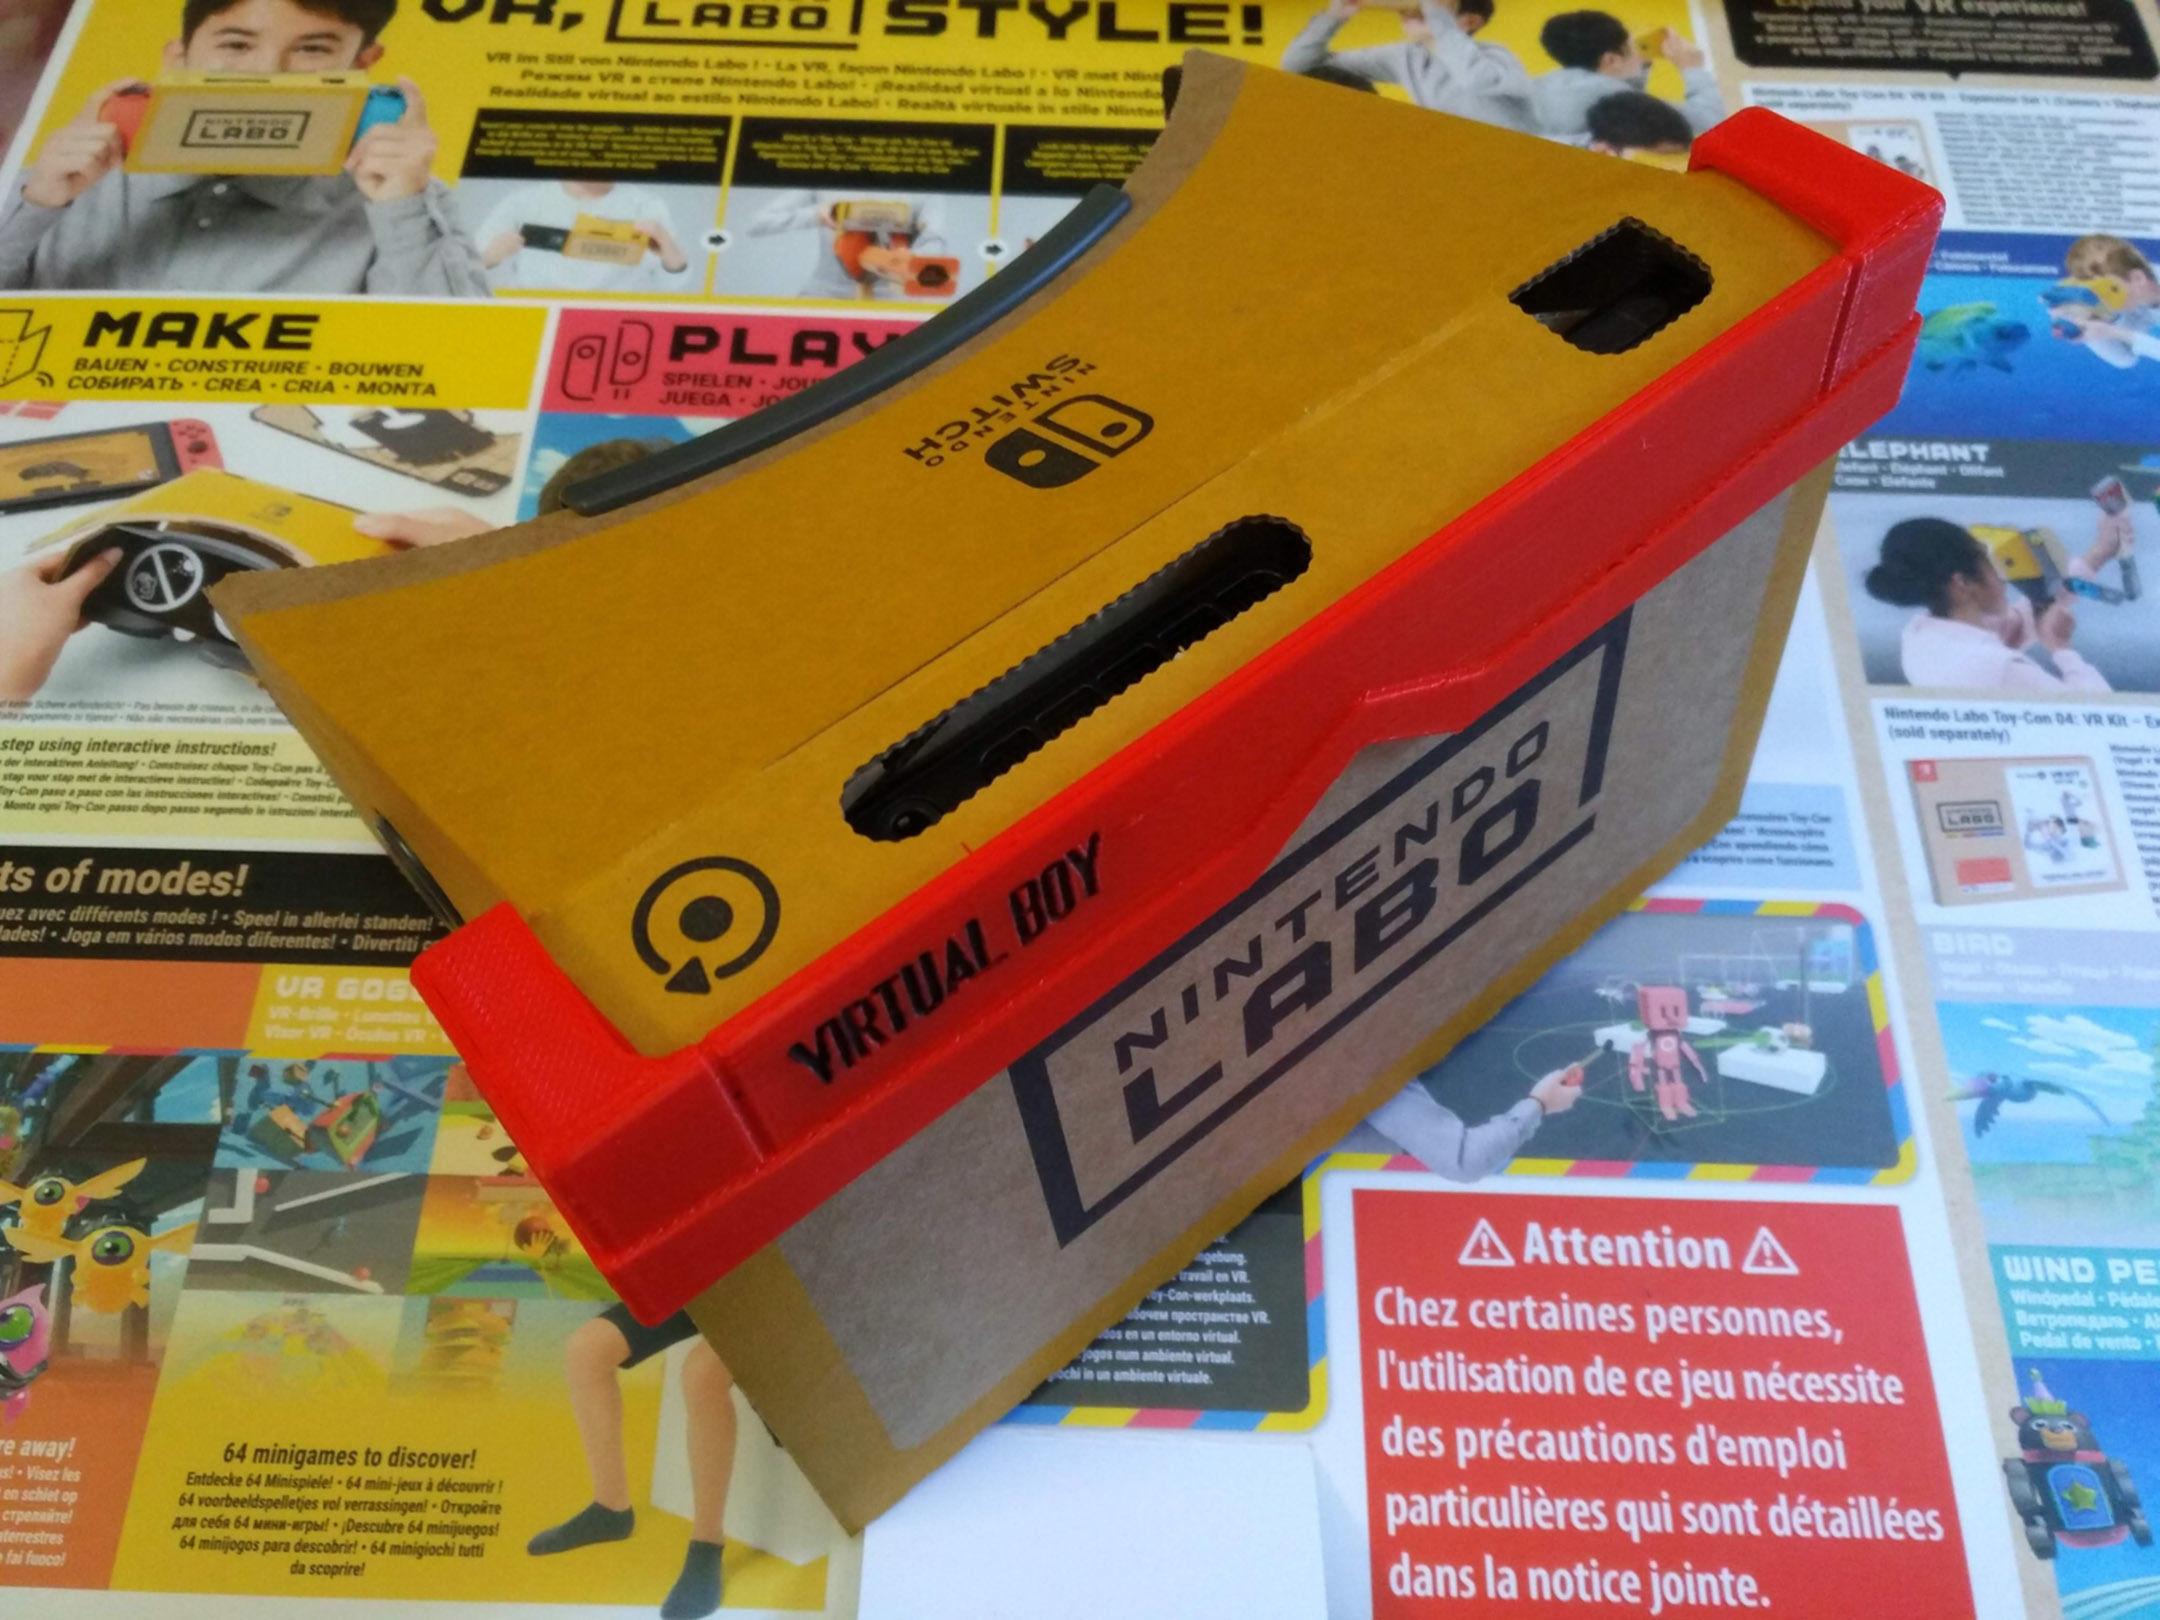 Virtual boy case for Nintendo labo VR-KIT